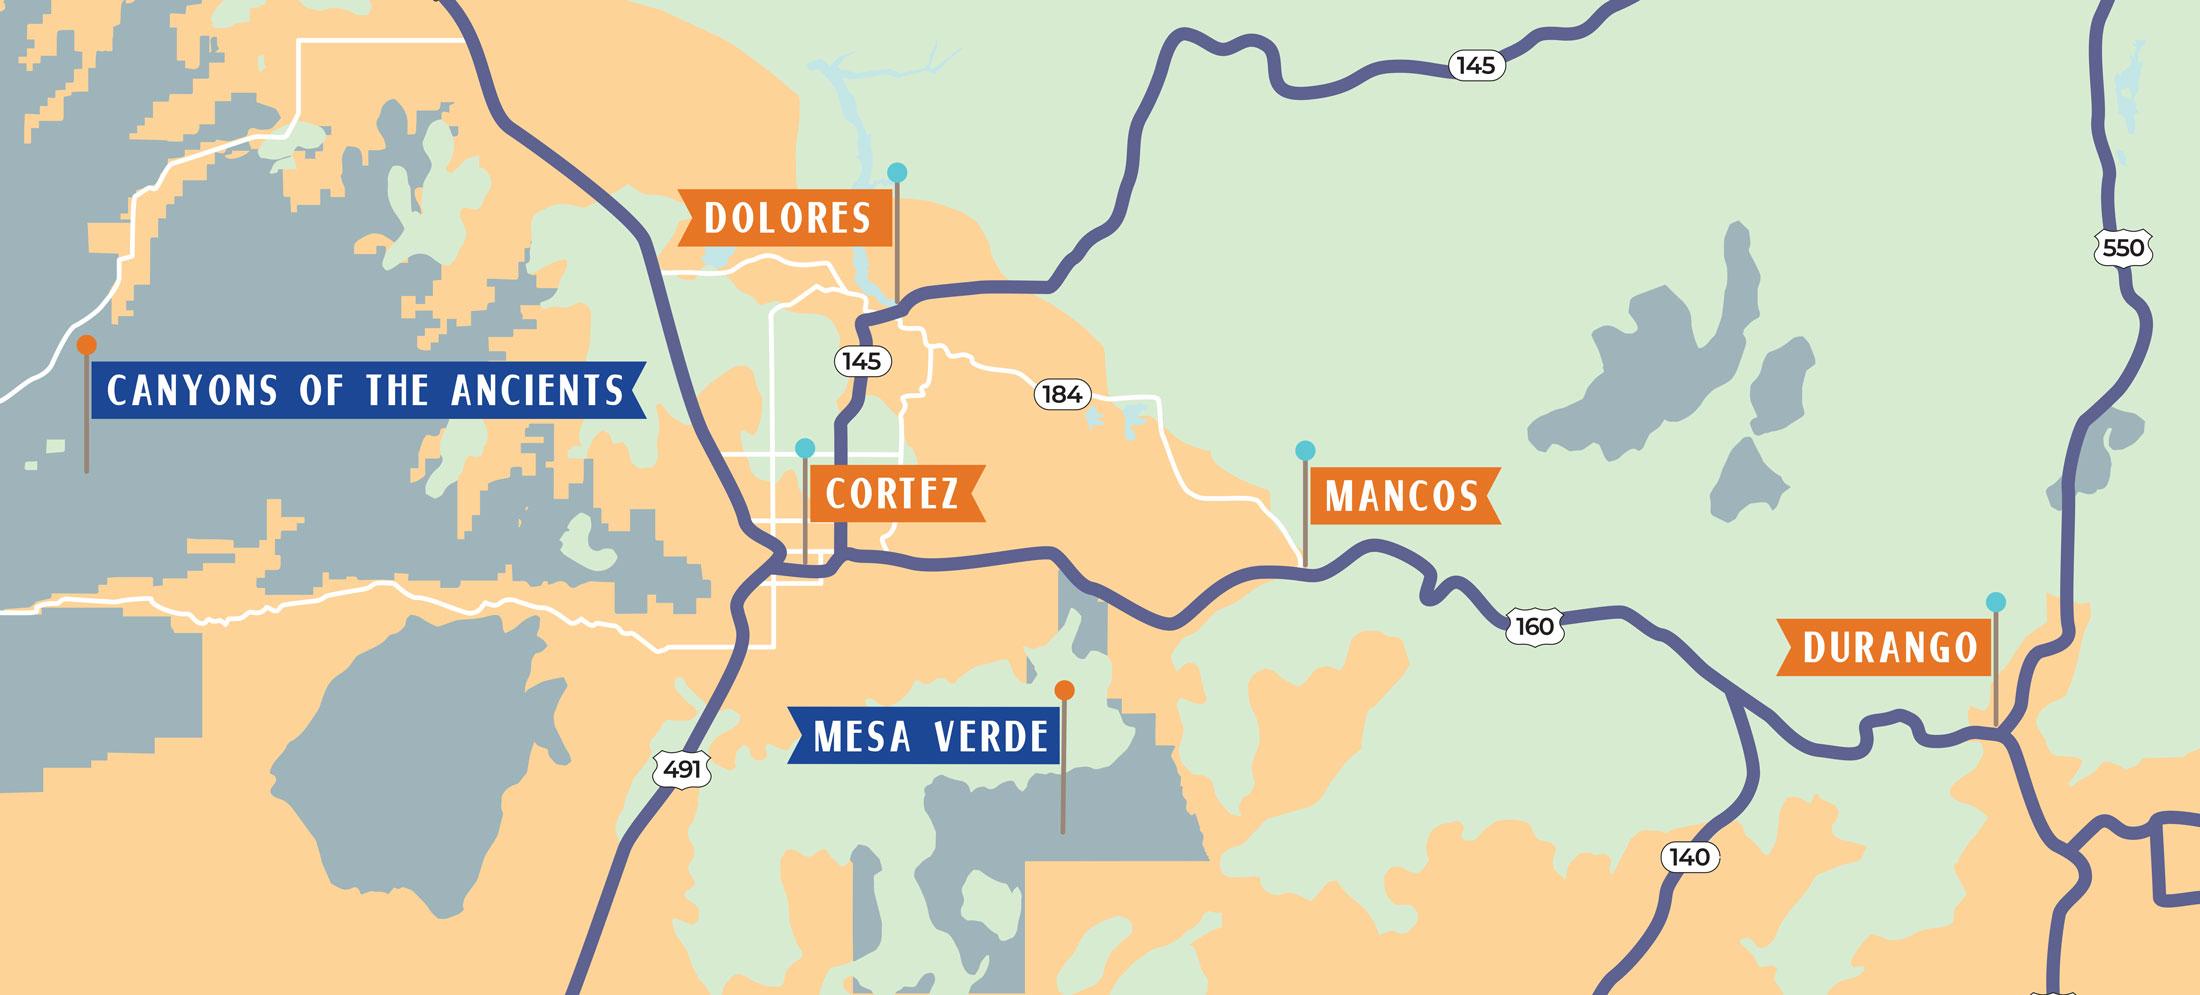 Ancient ruin locations based on proximity to Durango